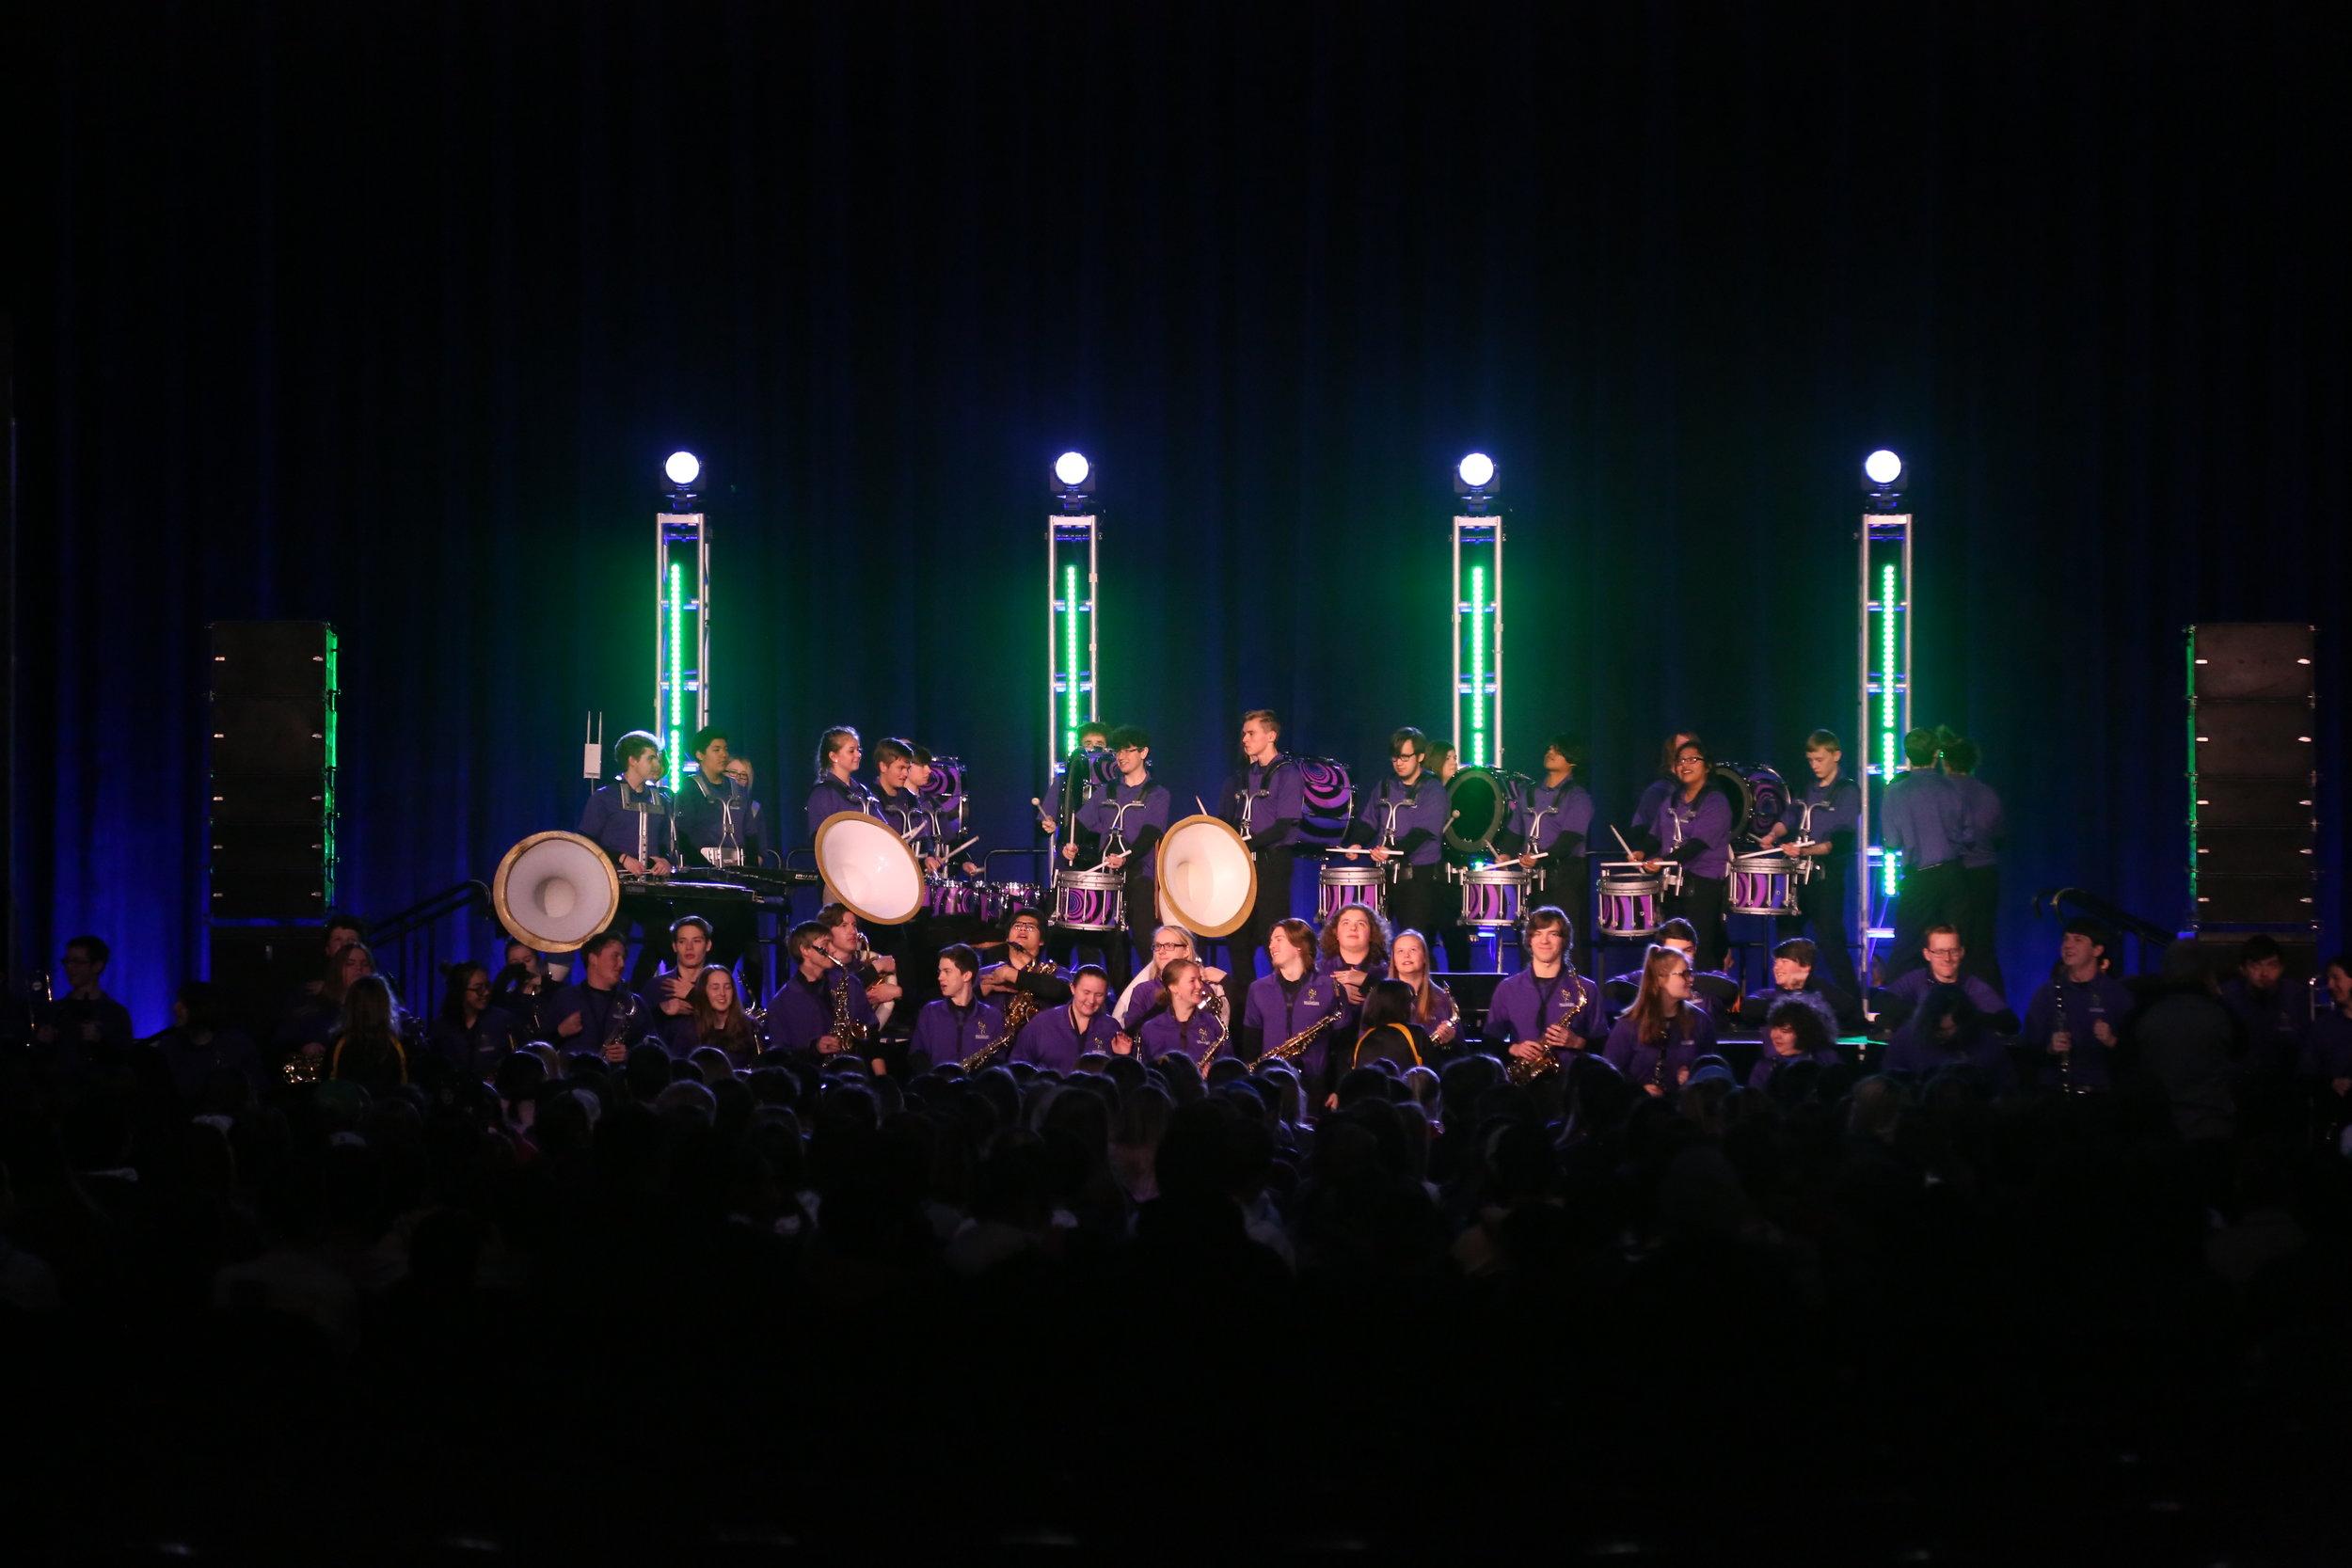 The Award Winning Sumner High School Band Kicking Off SERVUS 2019